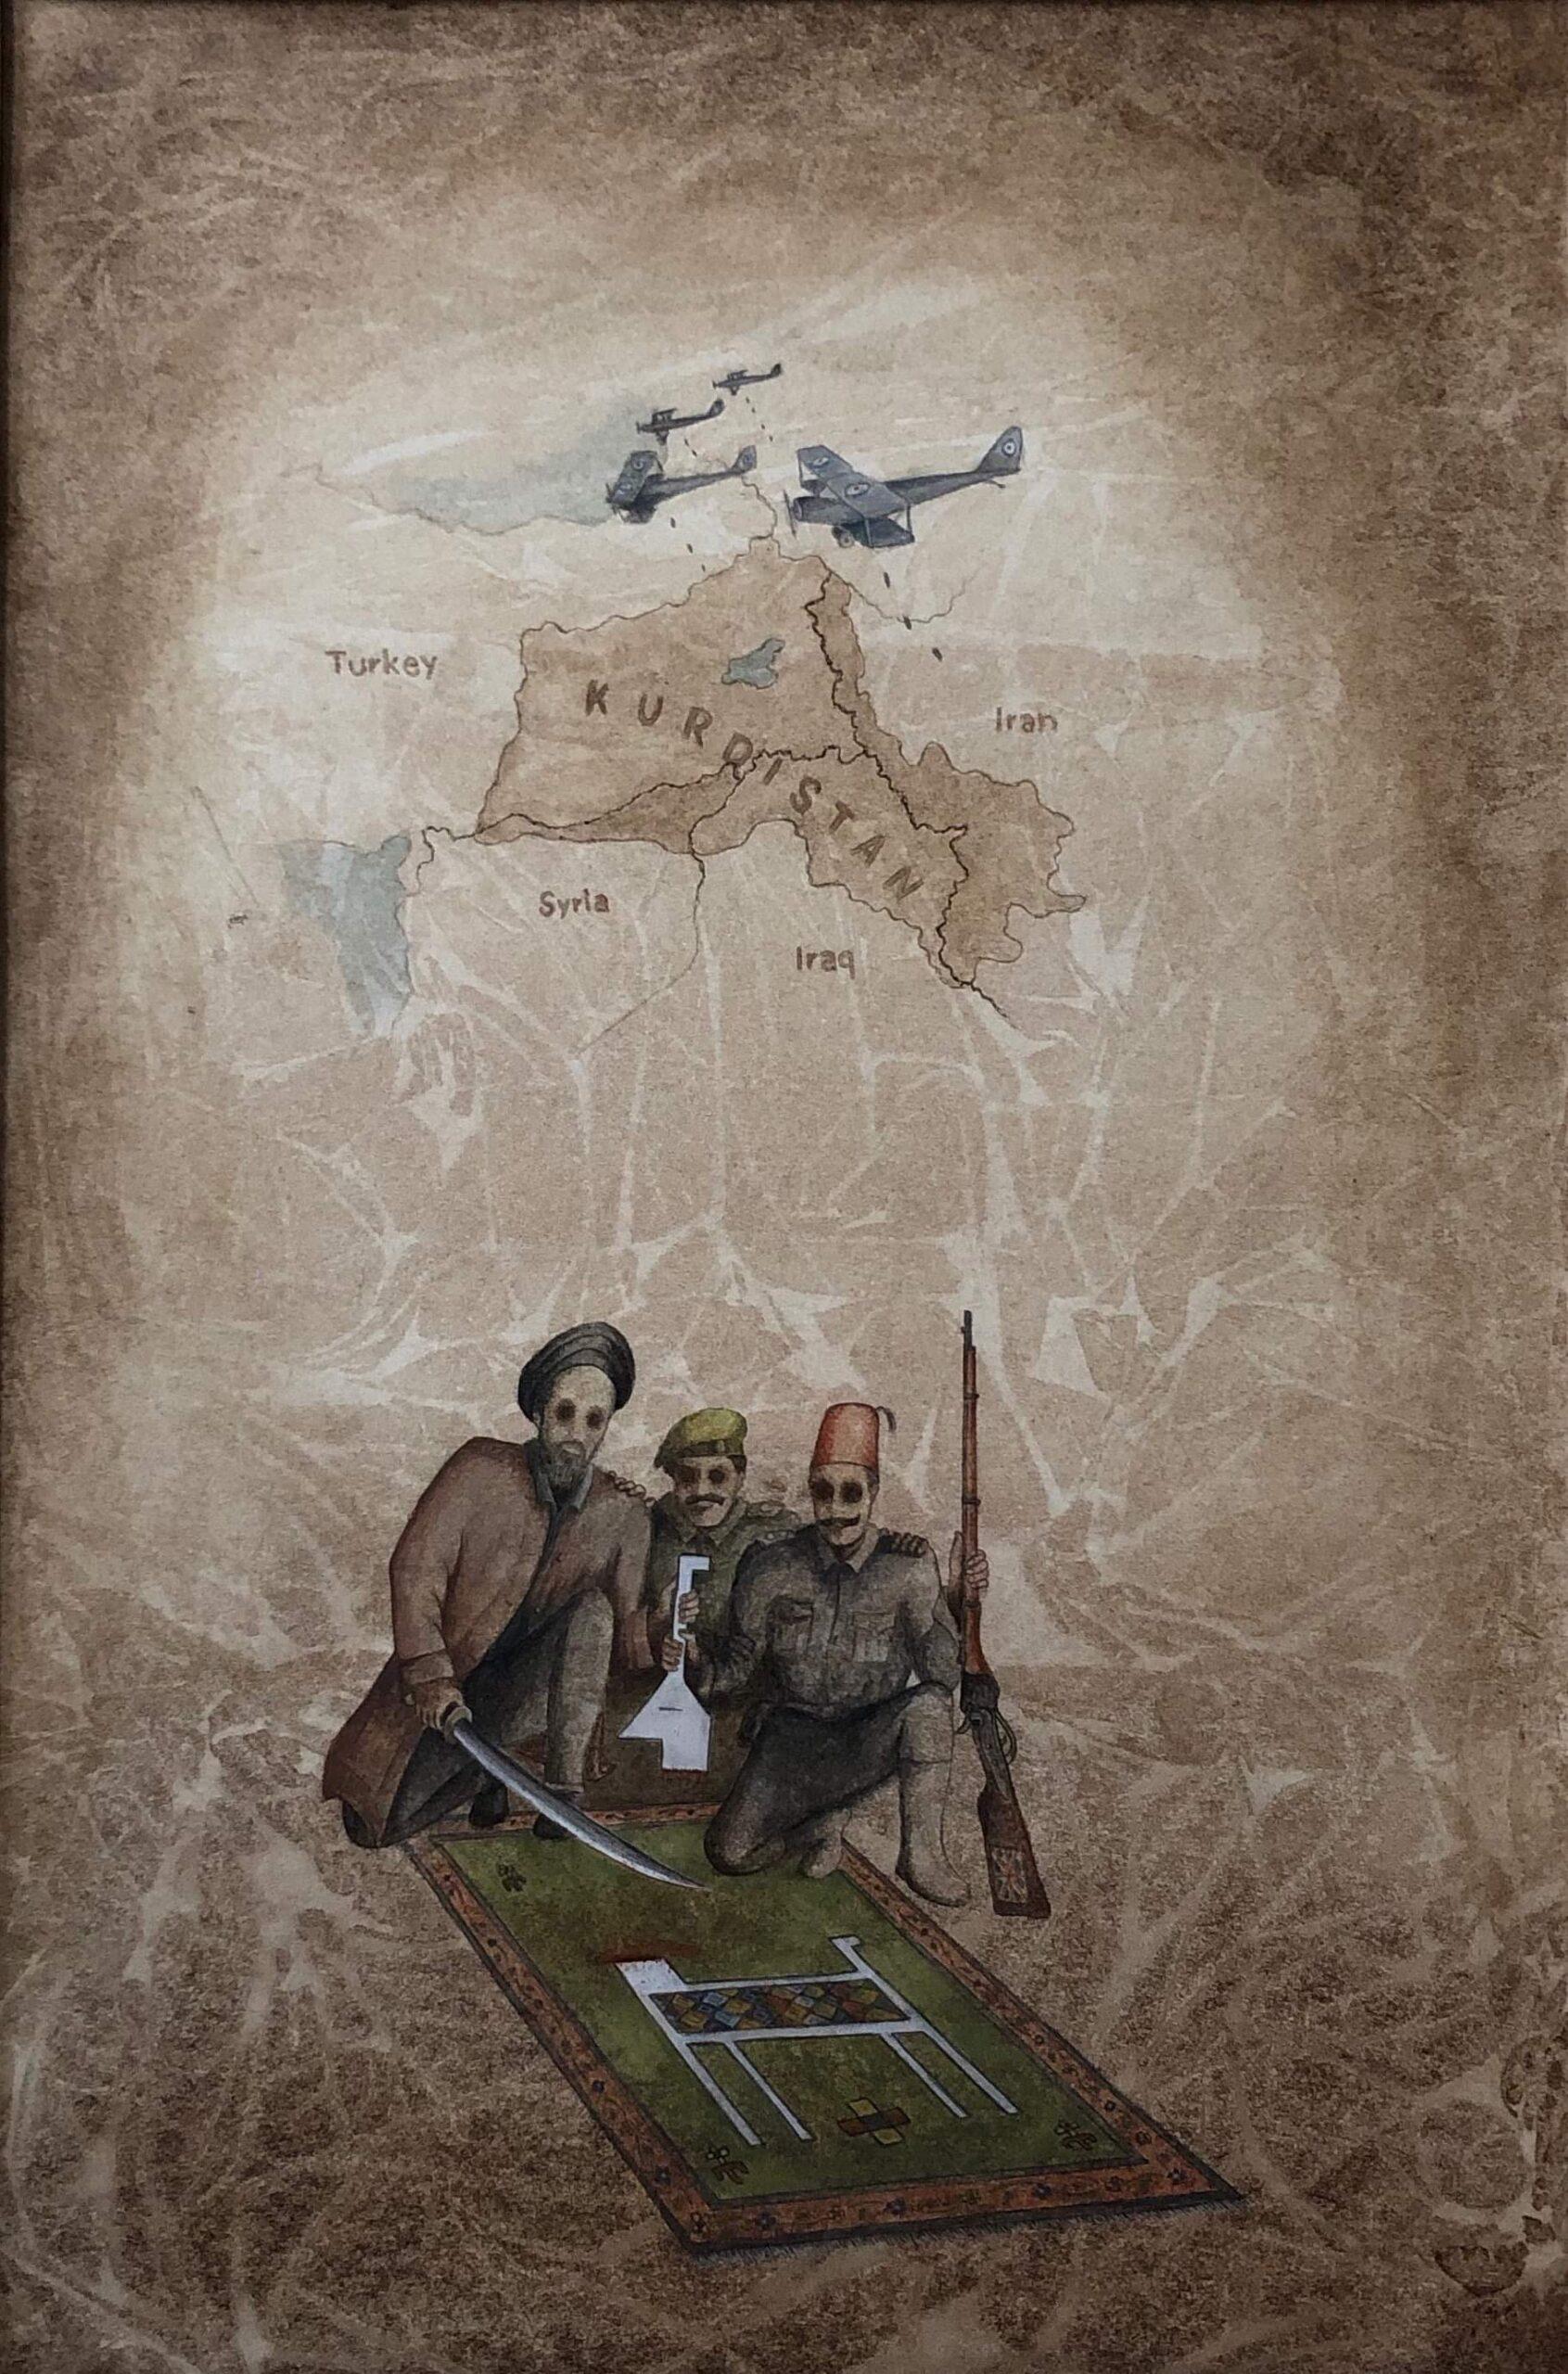 Artist Shorsh Saleh